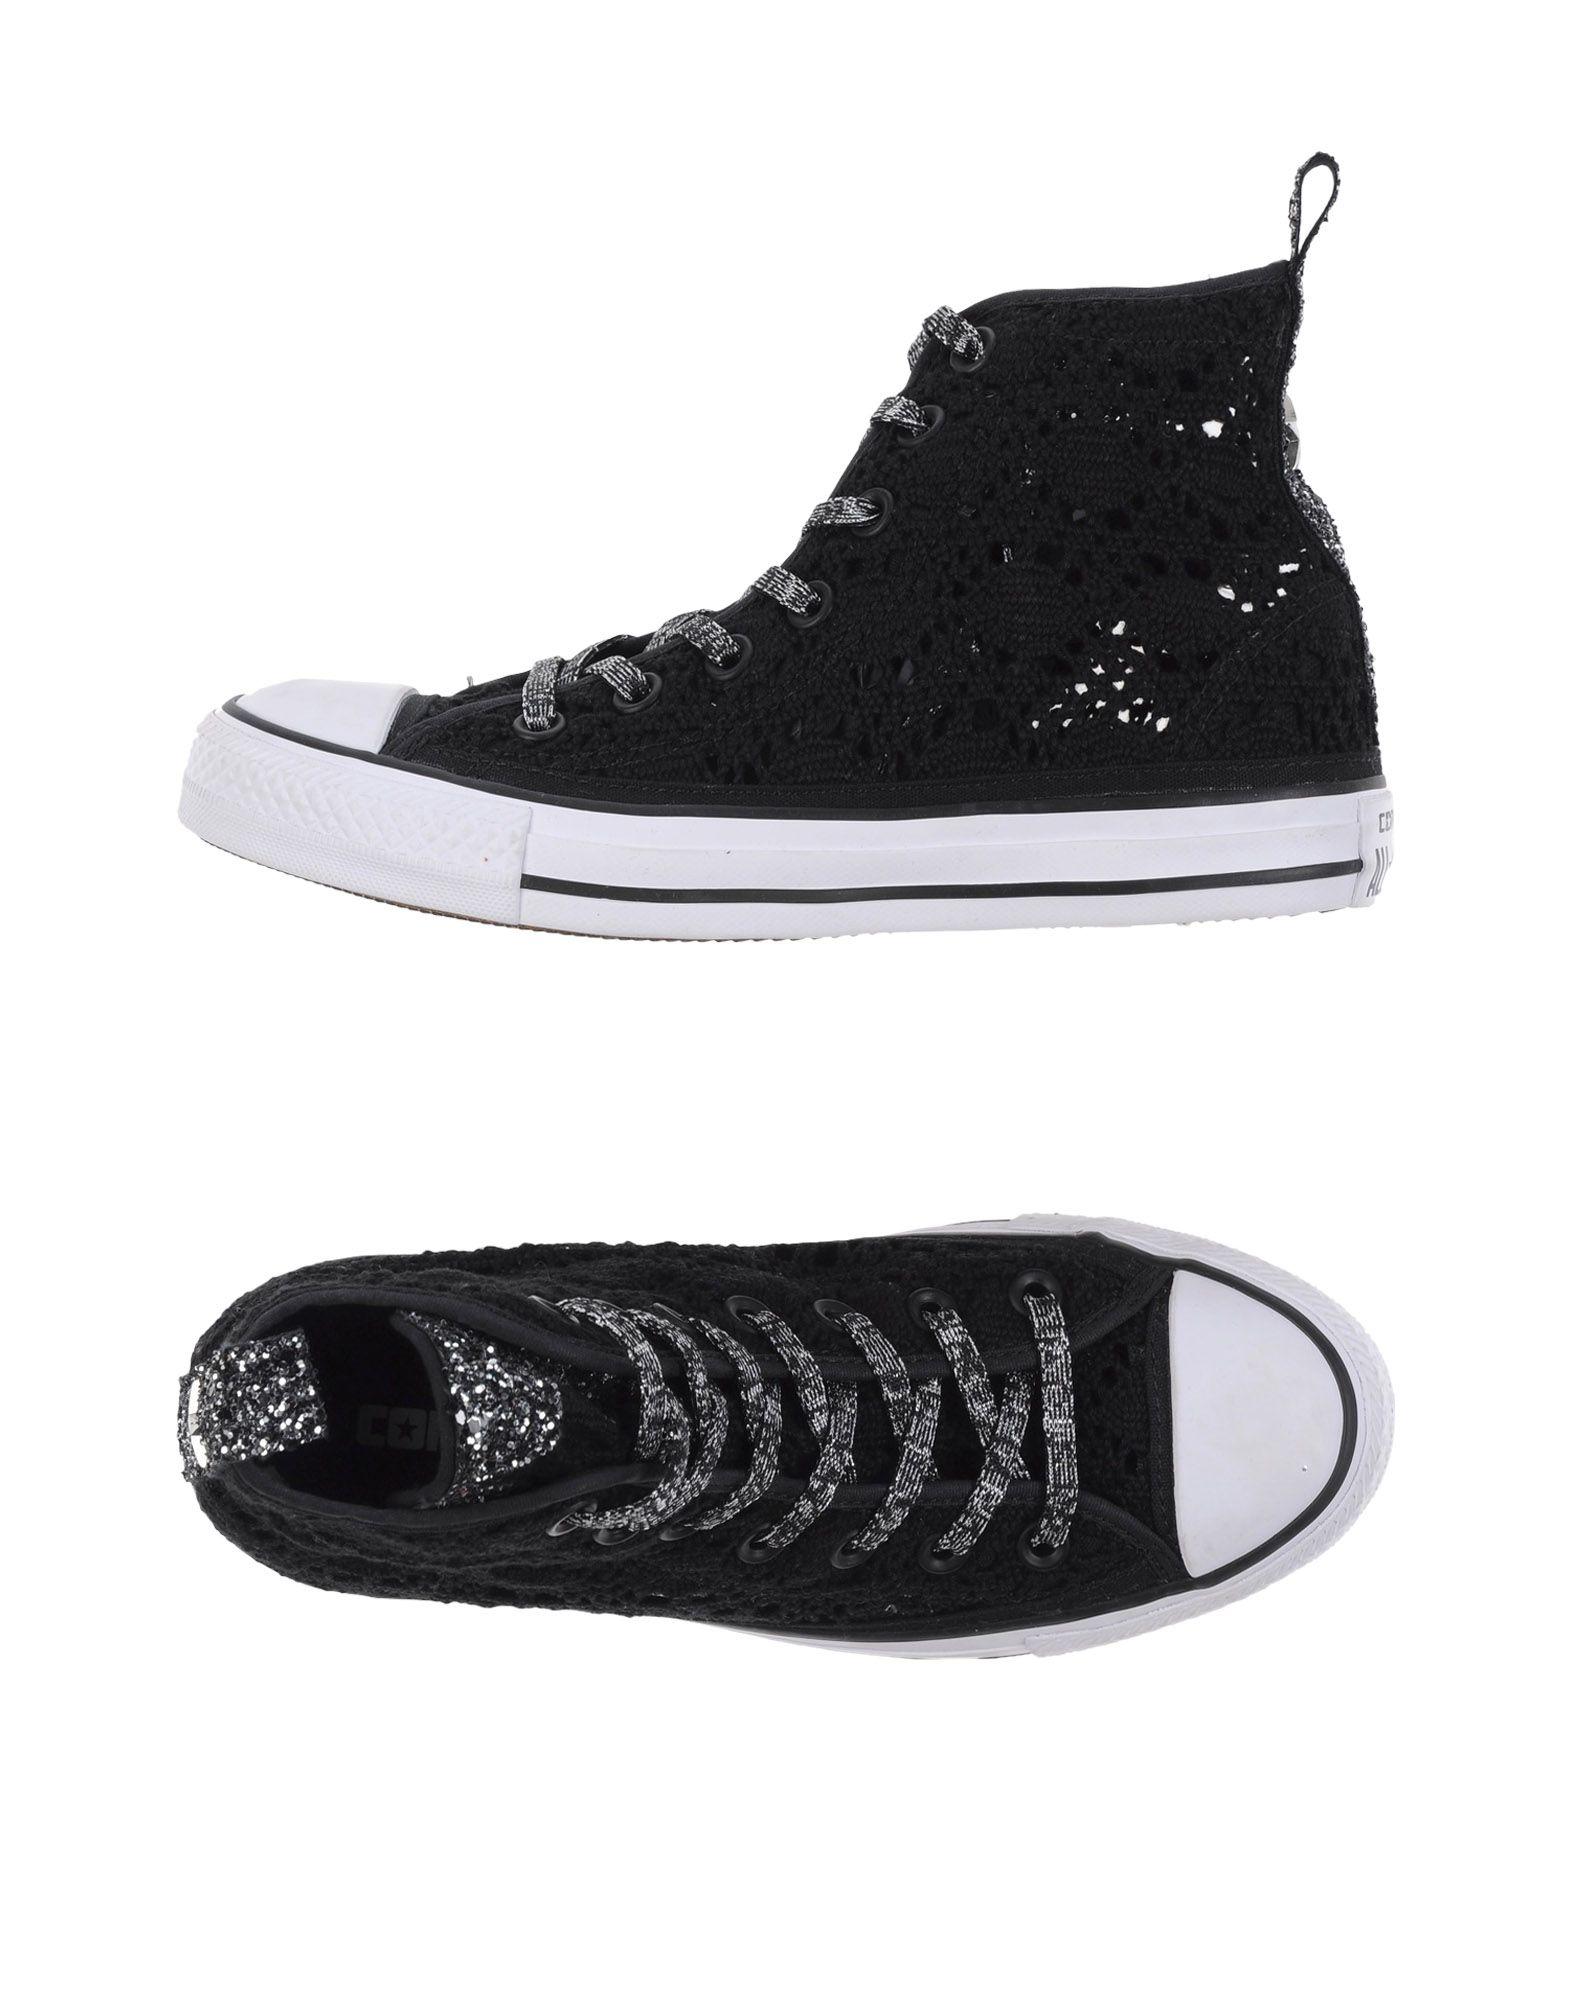 Converse Limited Gute Edition Sneakers Damen  11188494RJ Gute Limited Qualität beliebte Schuhe 82c137